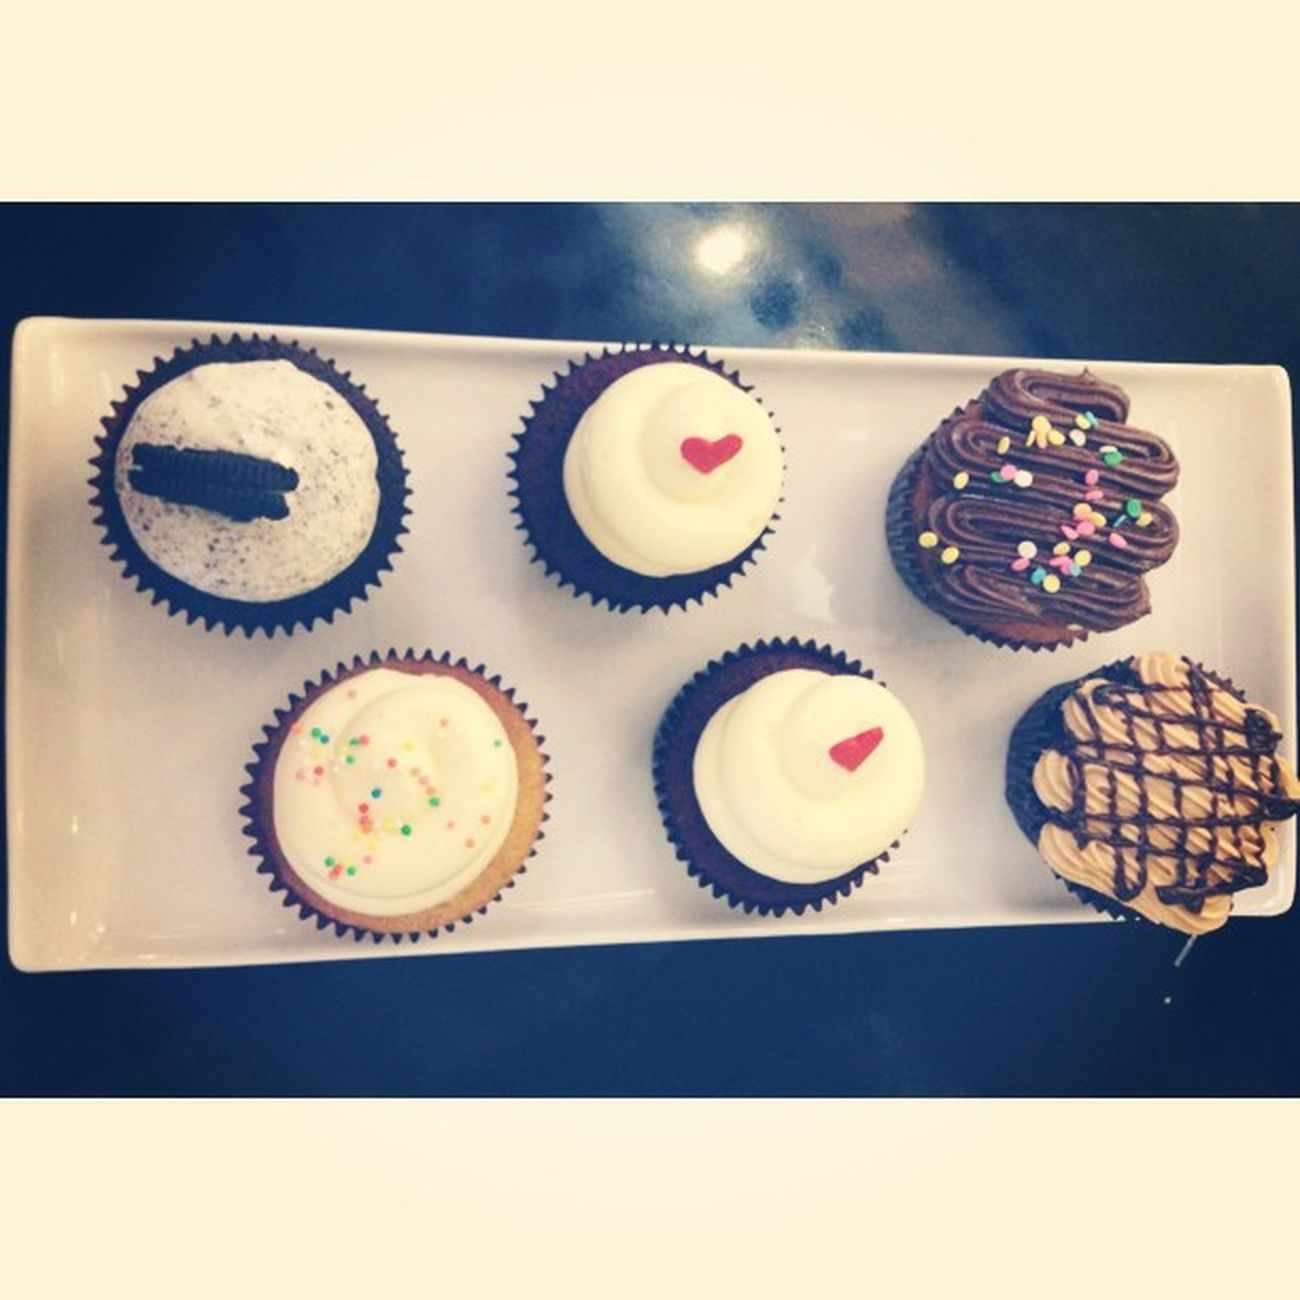 Squaready Twelvecupcakes Redvelvet Cupcakes Take a break, eat a cupcake.